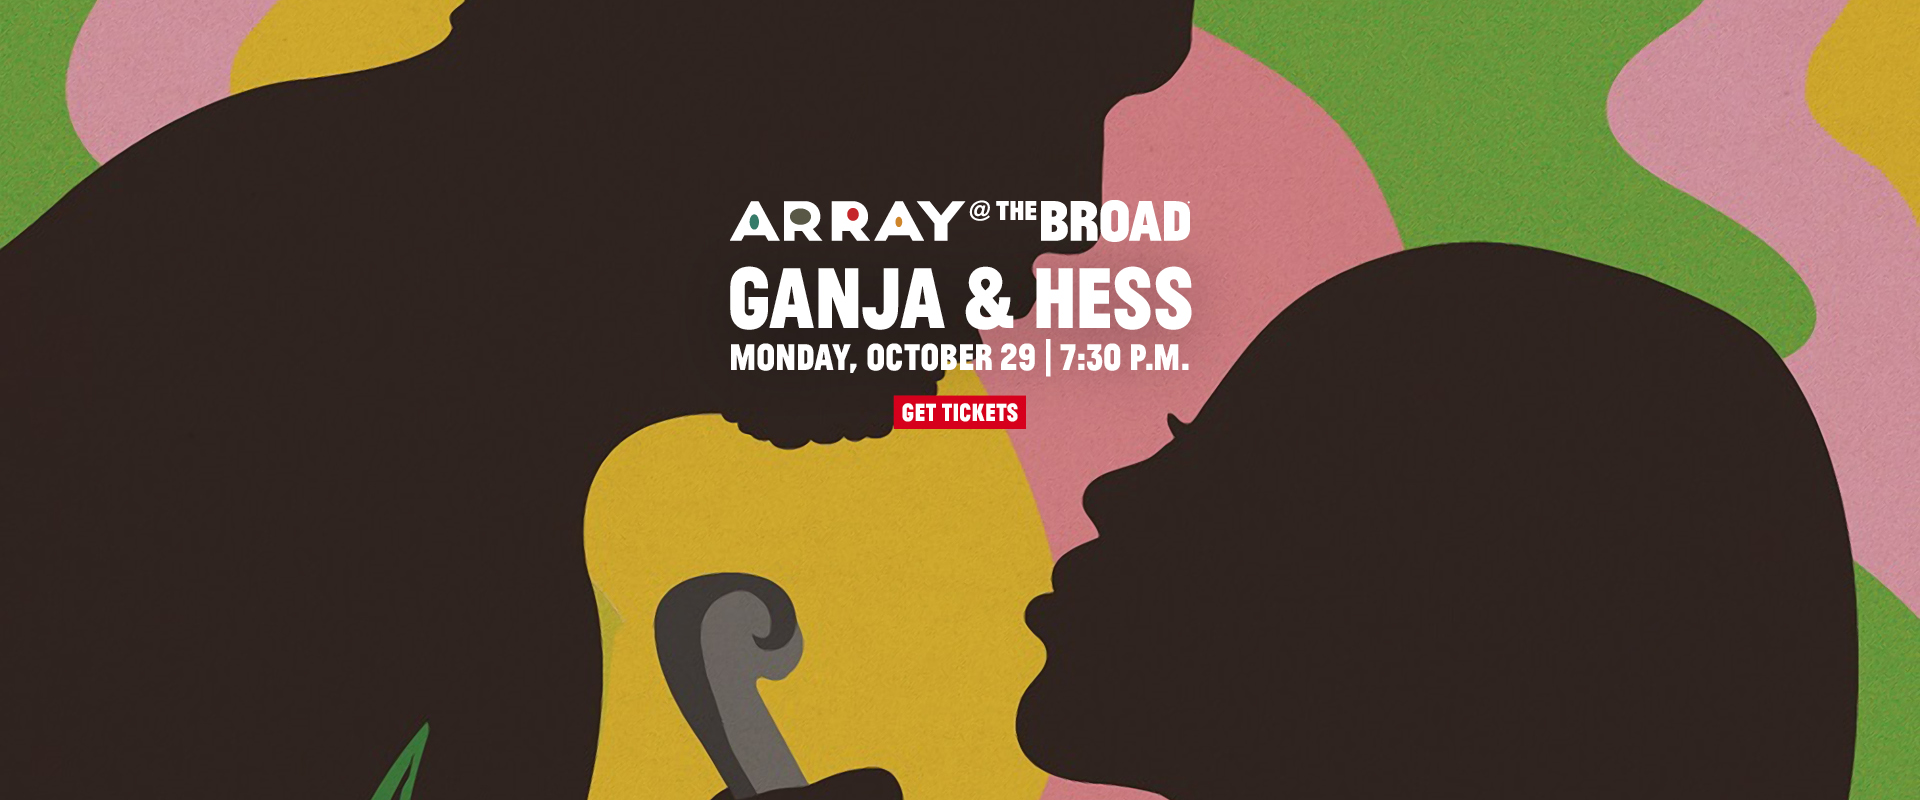 ARRAY @ The Broad: Ganja & Hess